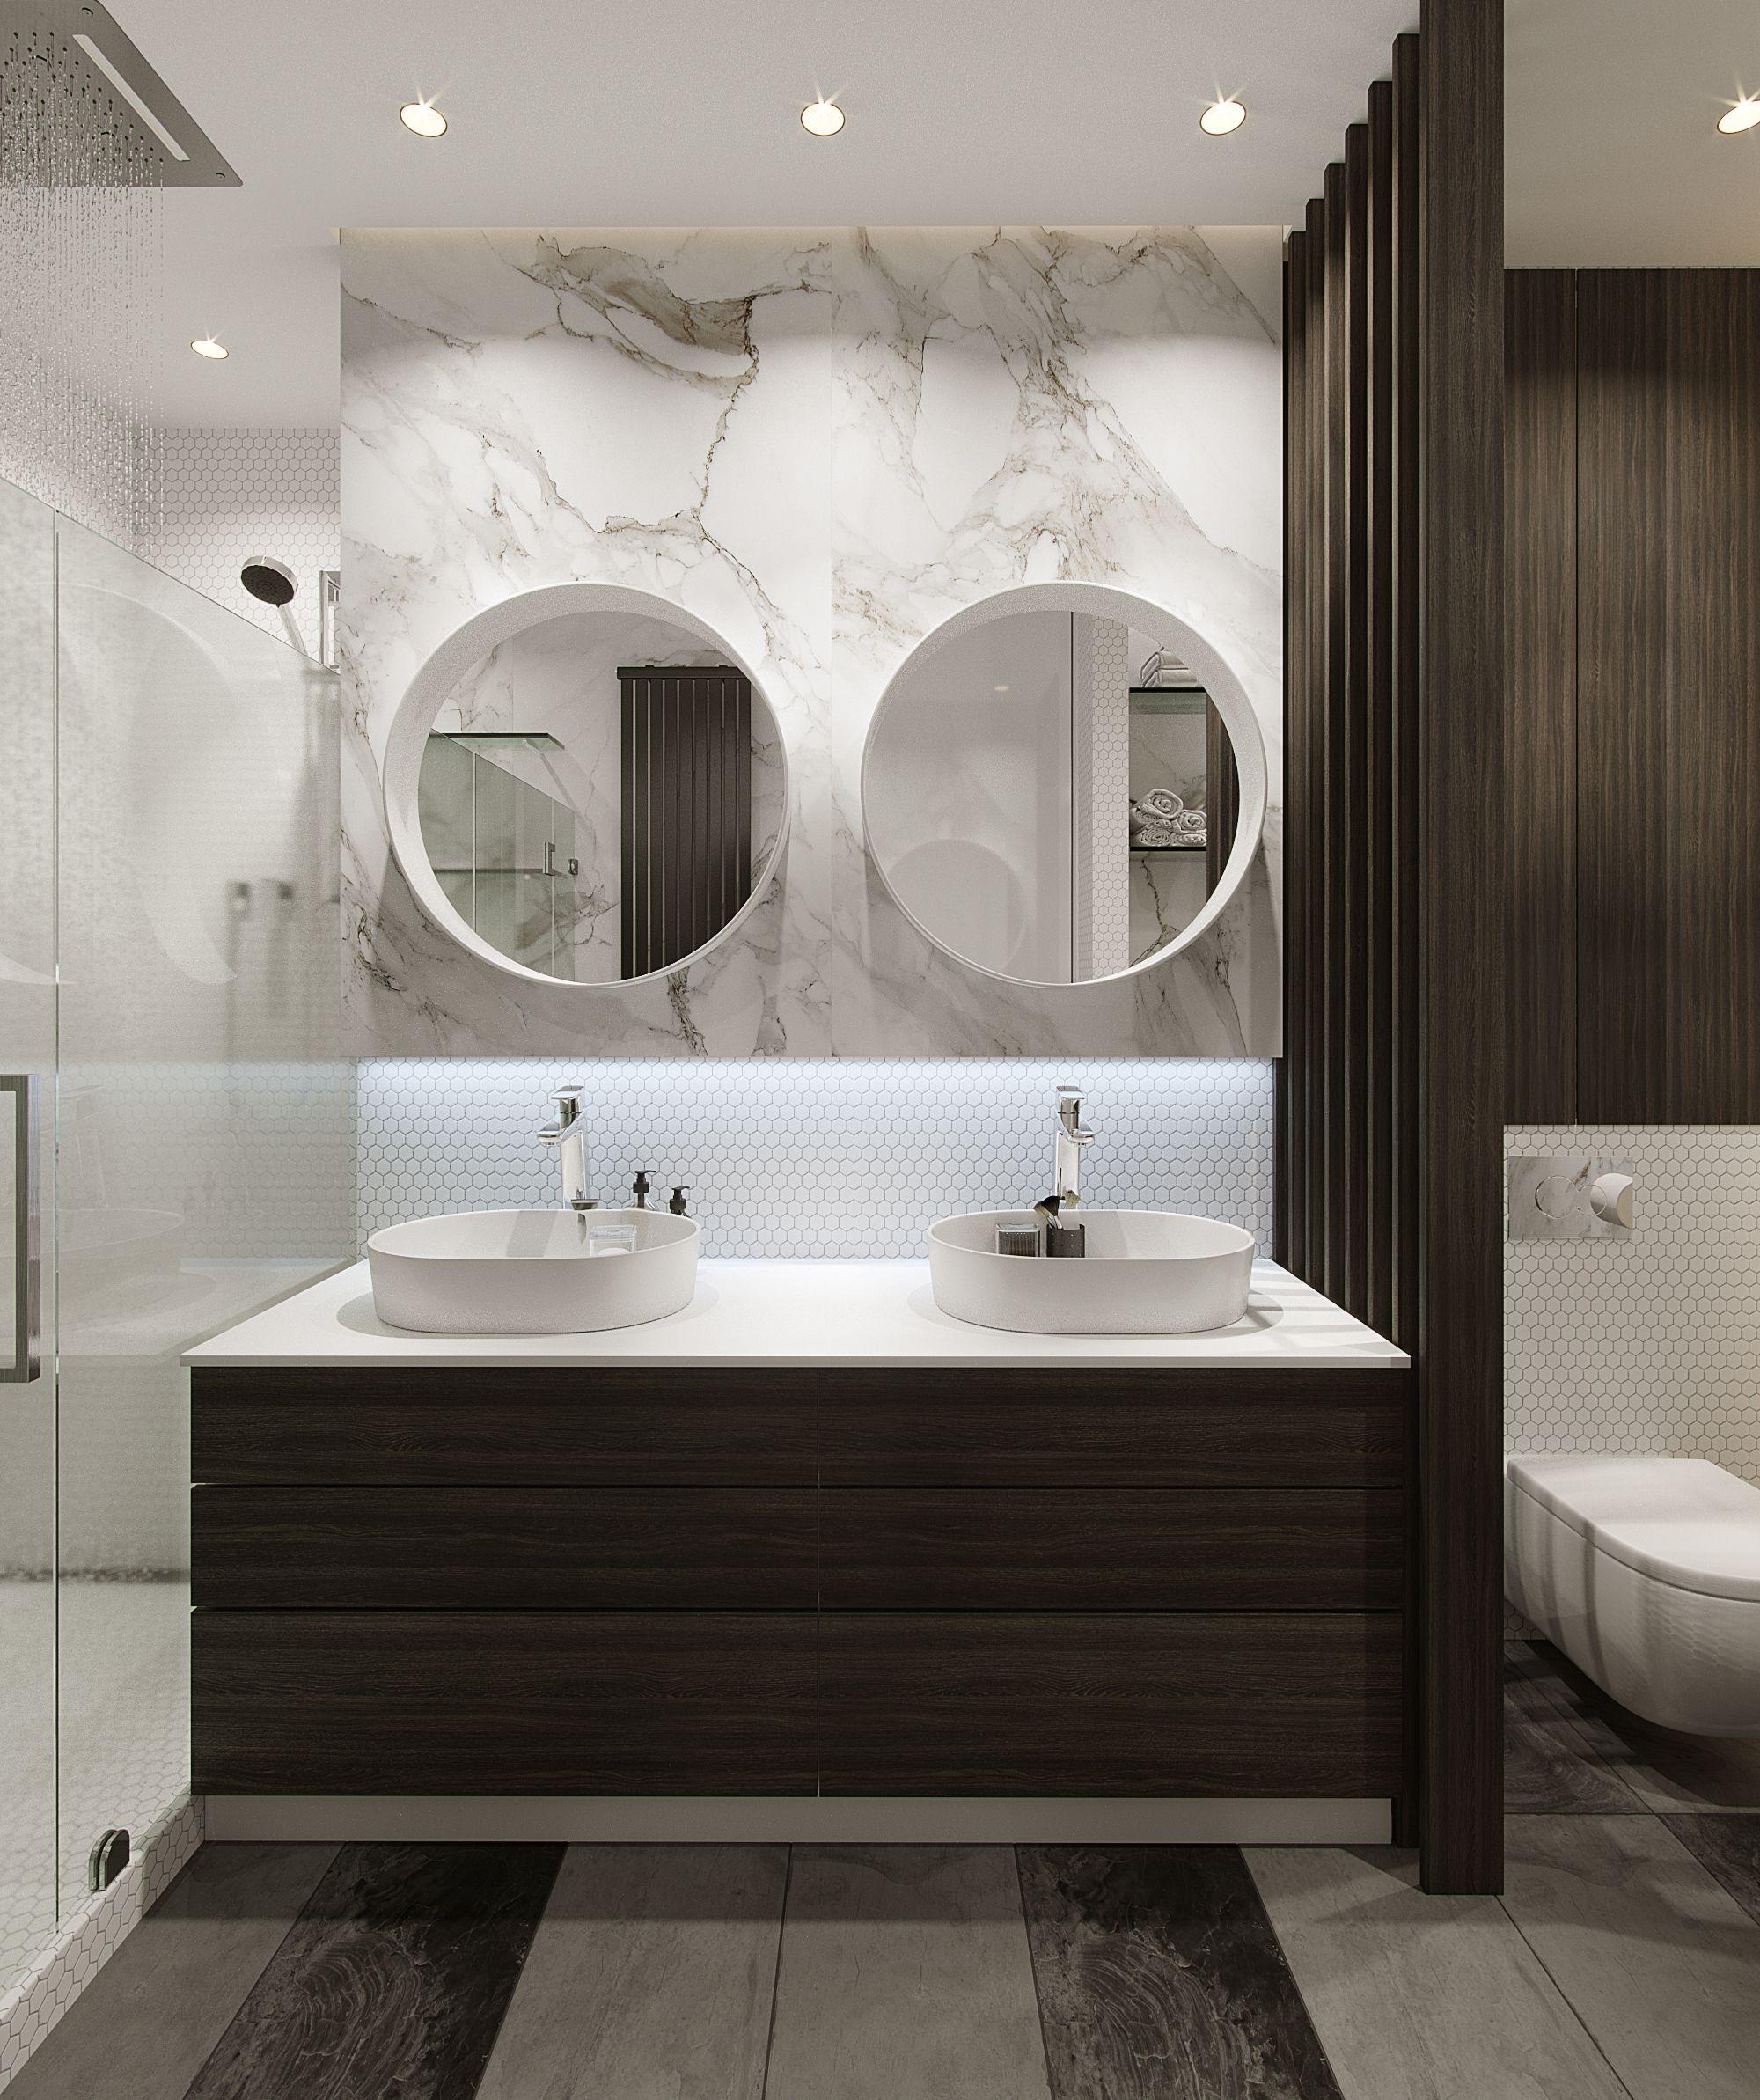 Showcase And Discover Creative Work On The World S Leading Online Platform For Creative Indus Bathroom Design Inspiration Modern Bathroom Design Bathroom Decor